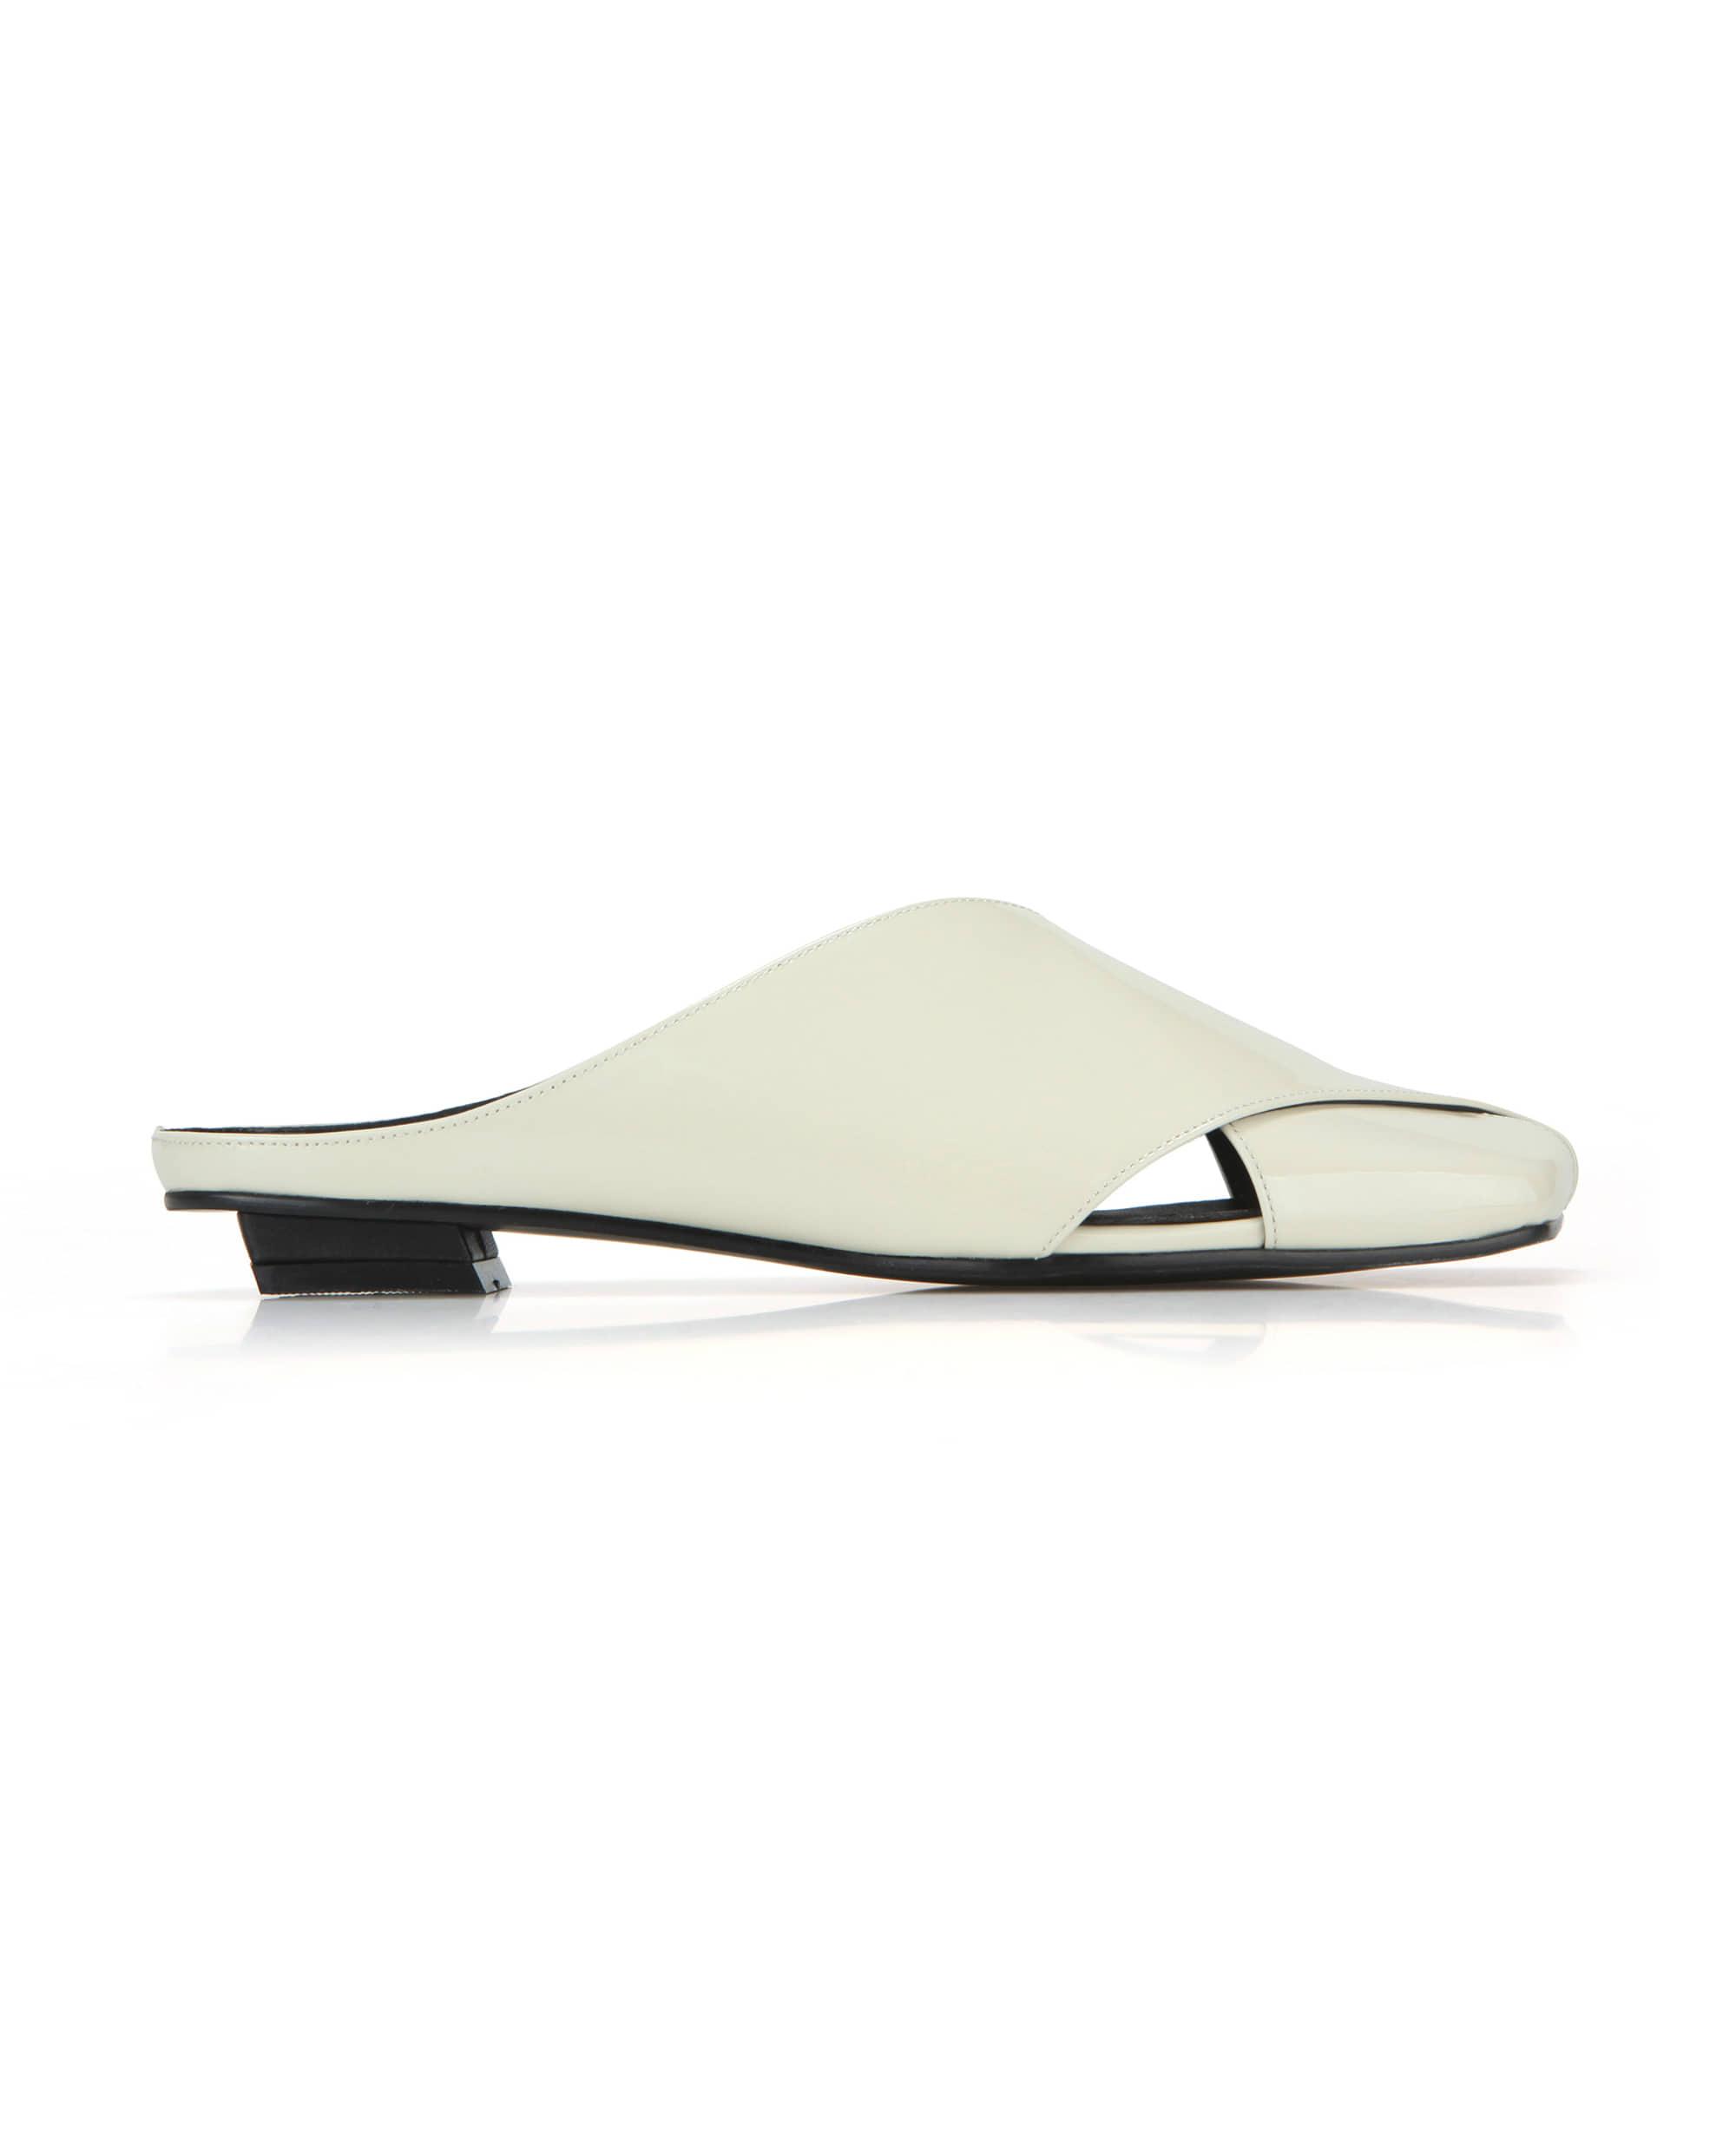 Squared toe crisscross flats | Glossy butter